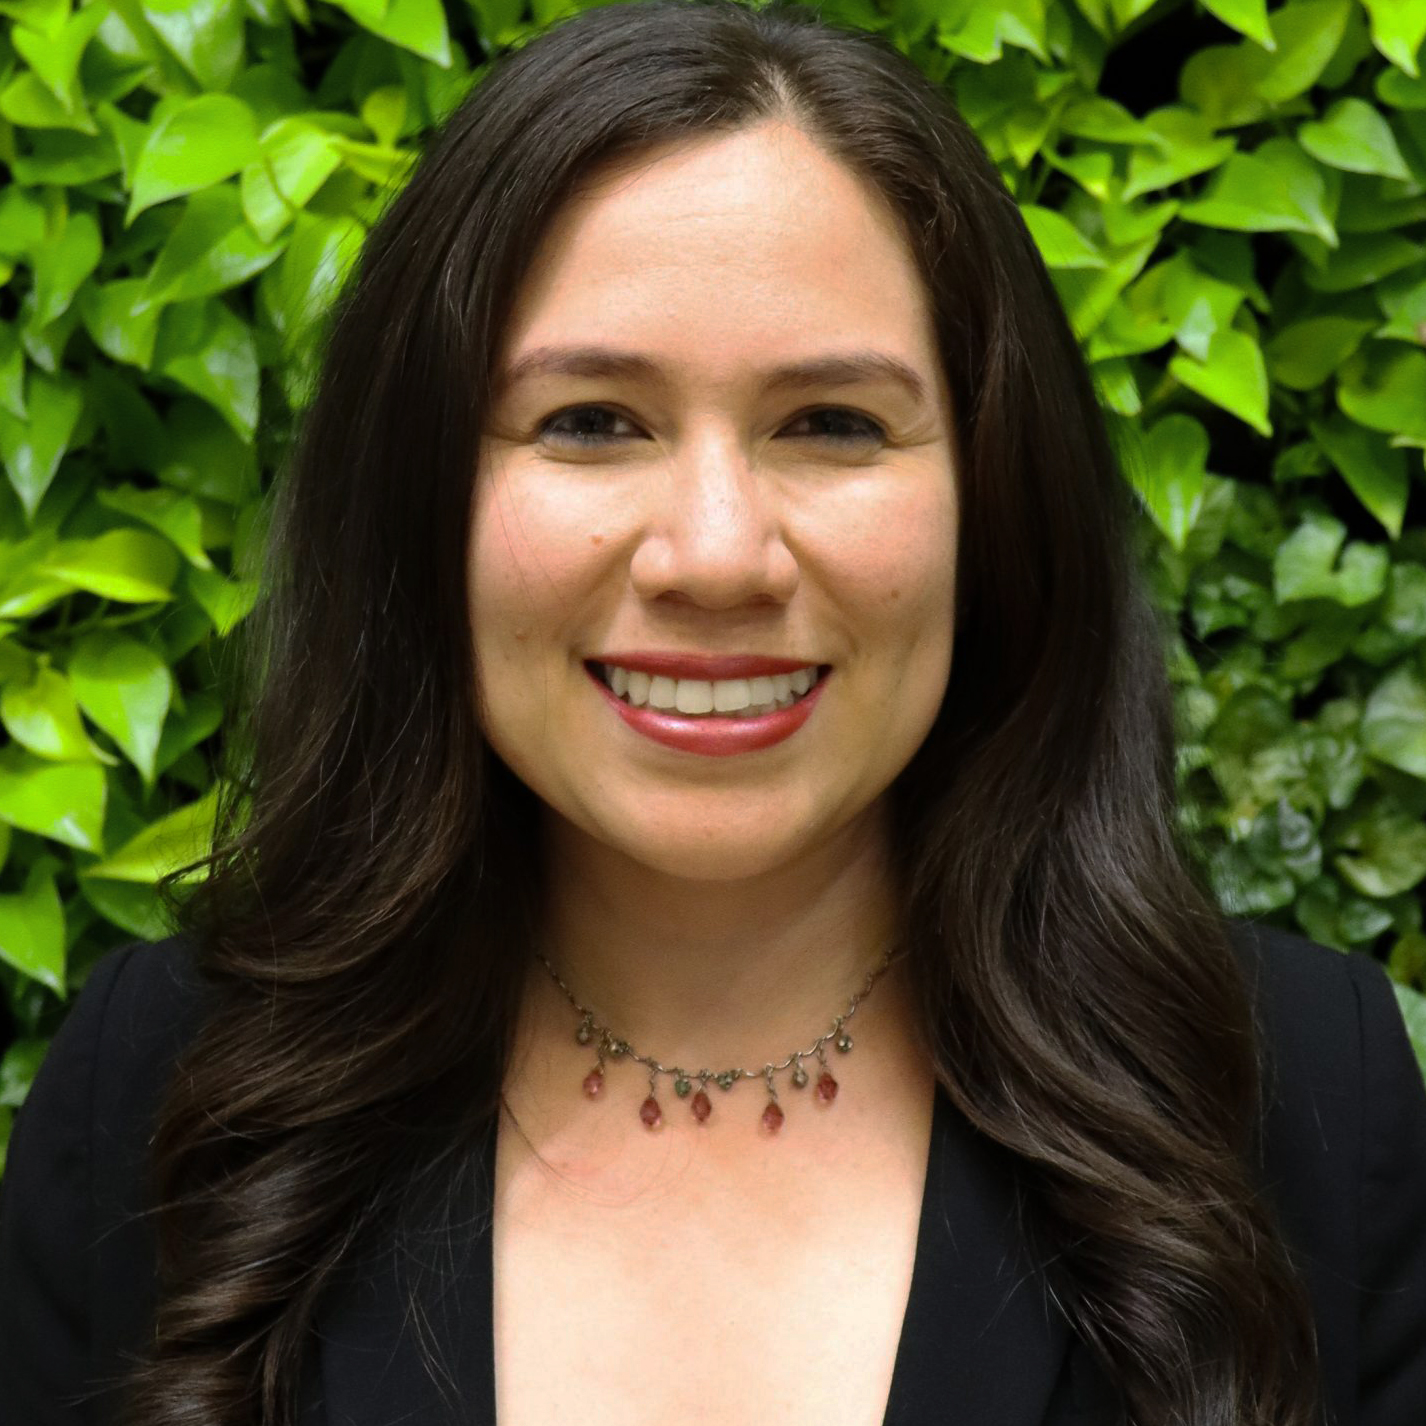 Natalie Hernandez Headshot